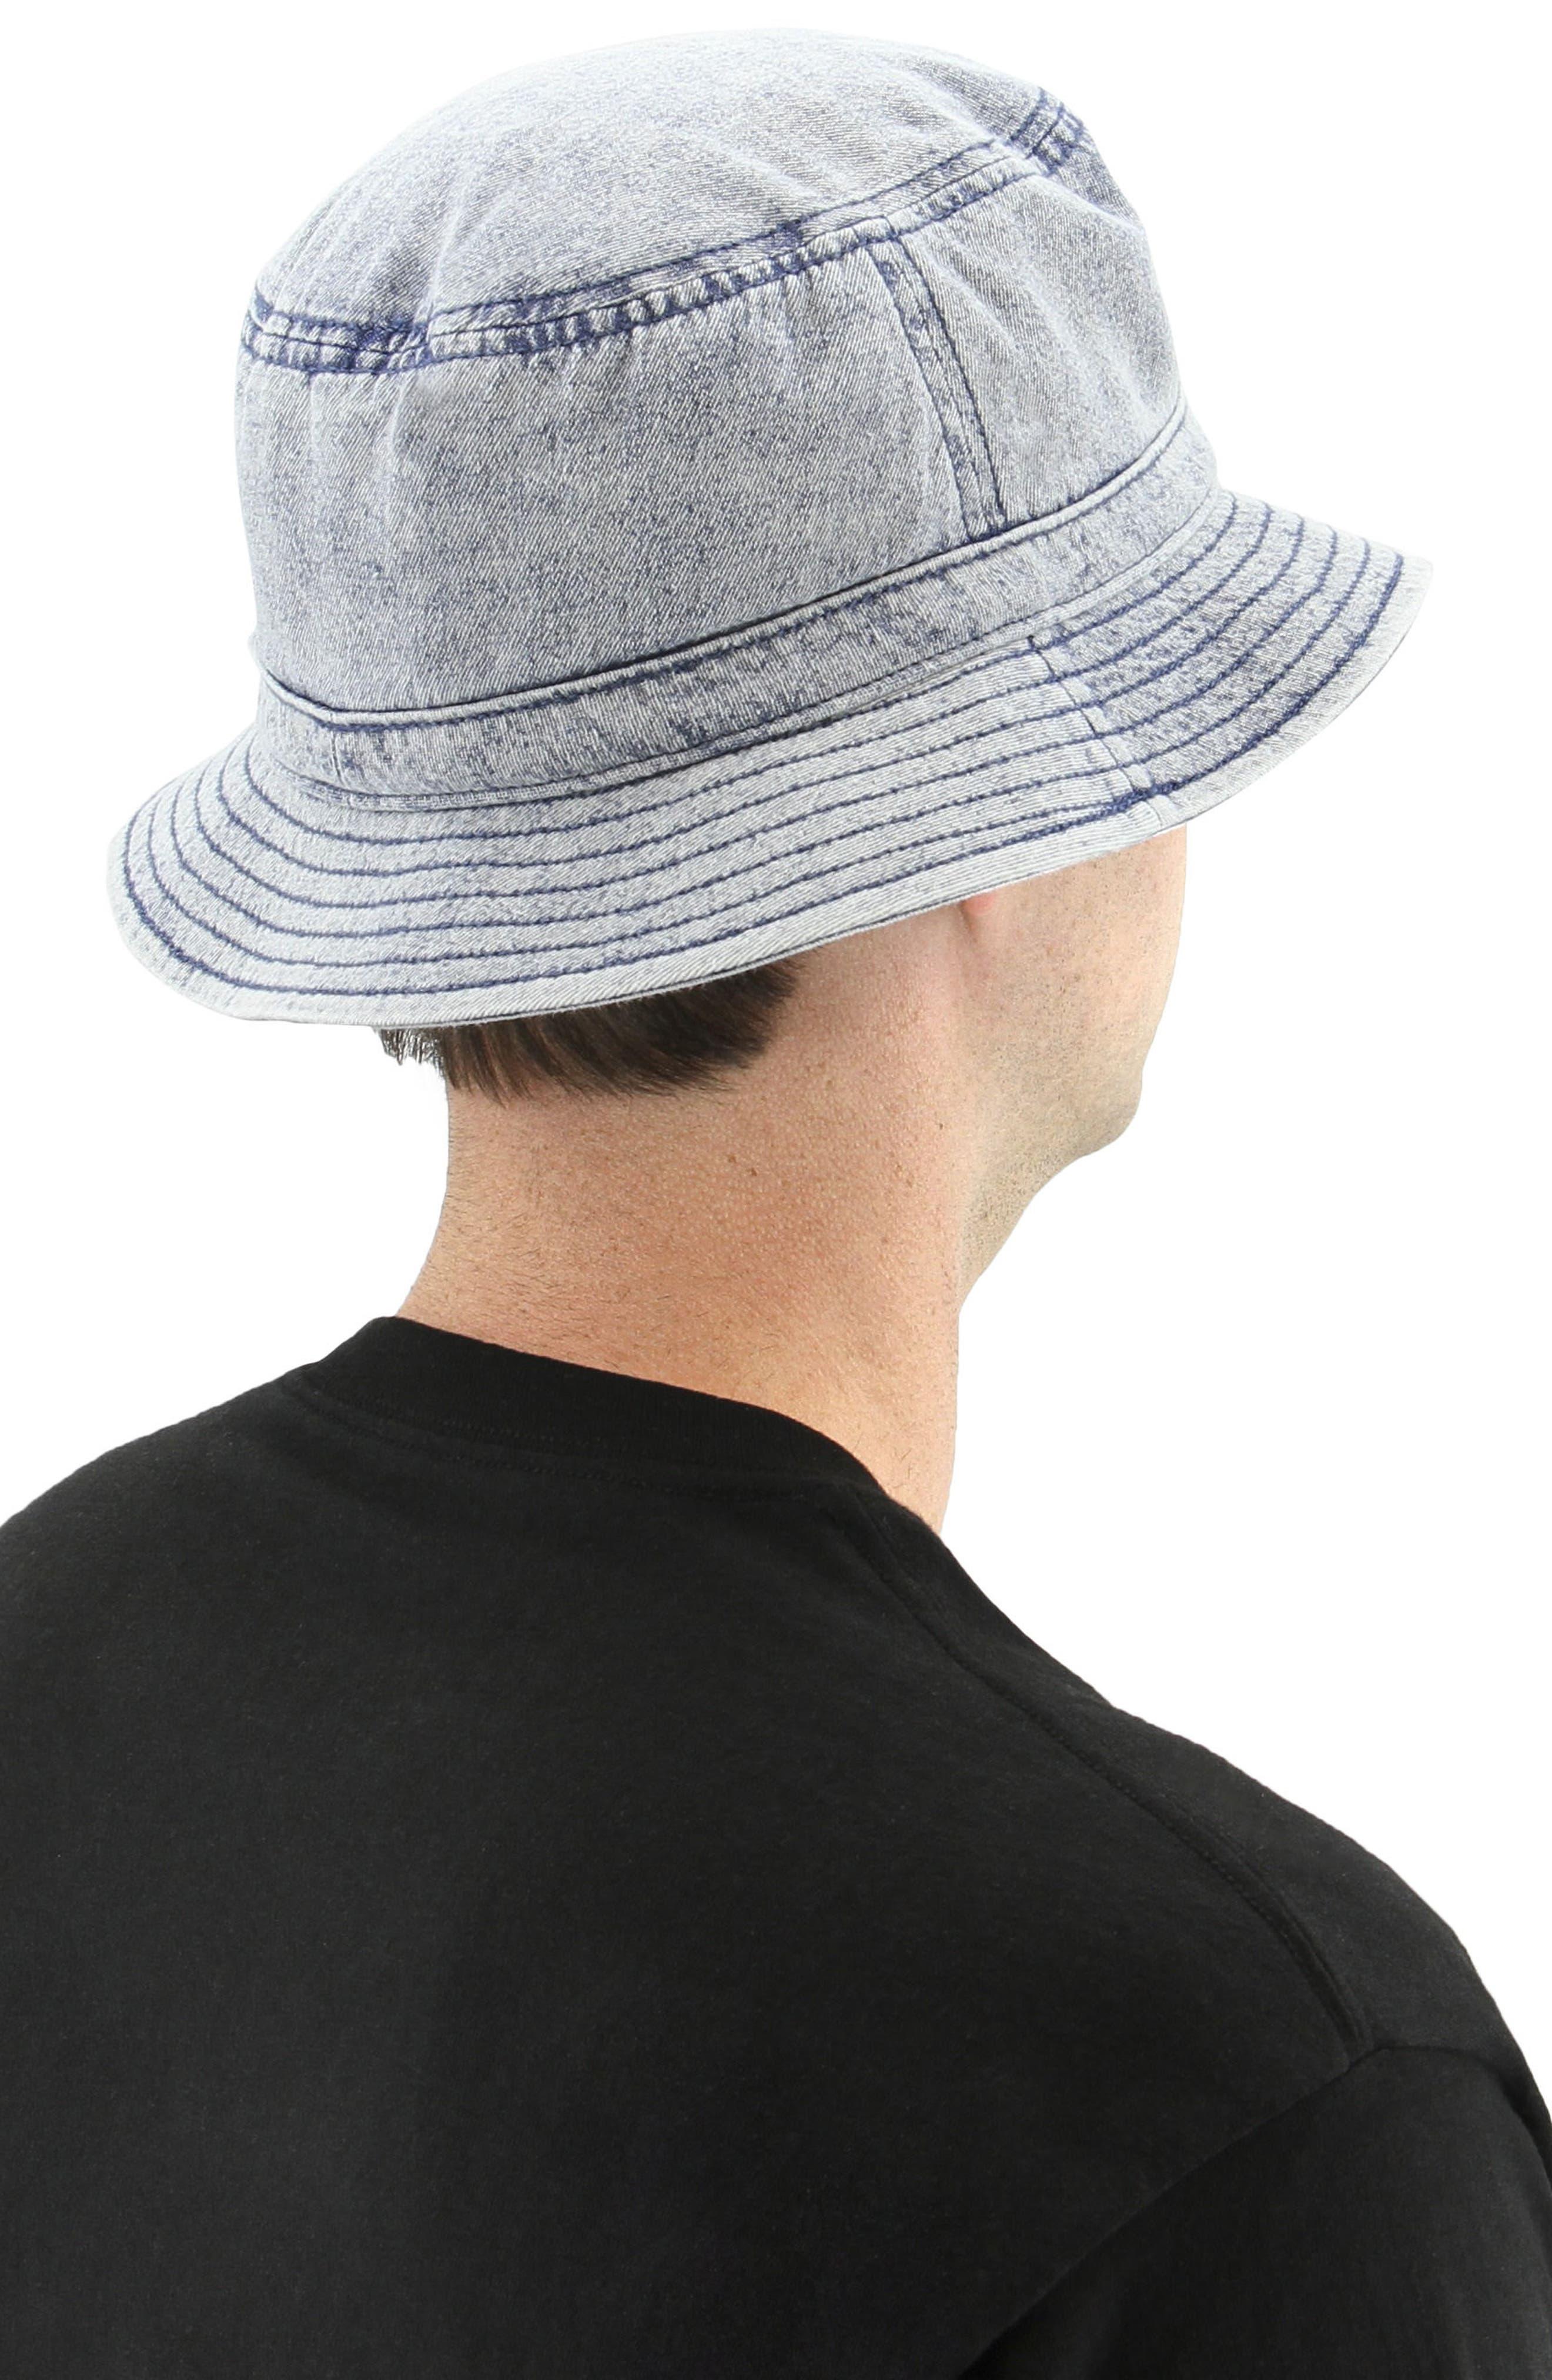 Denim Bucket Hat,                             Alternate thumbnail 2, color,                             Navy/ Black